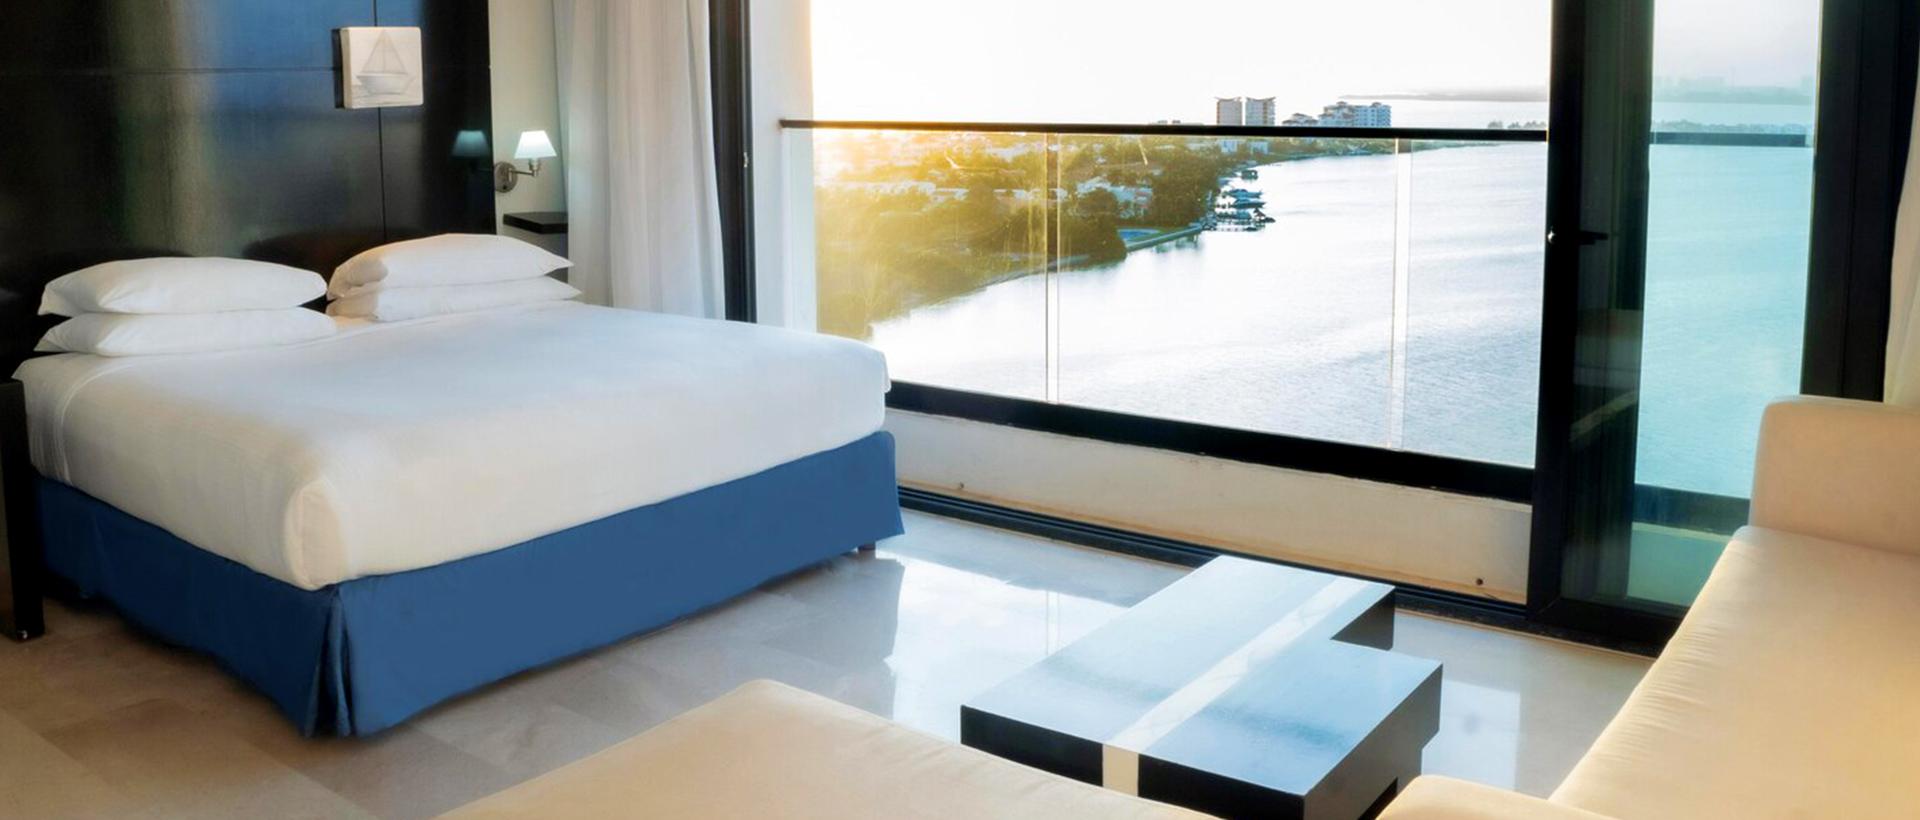 Rooms & Suites Armar House